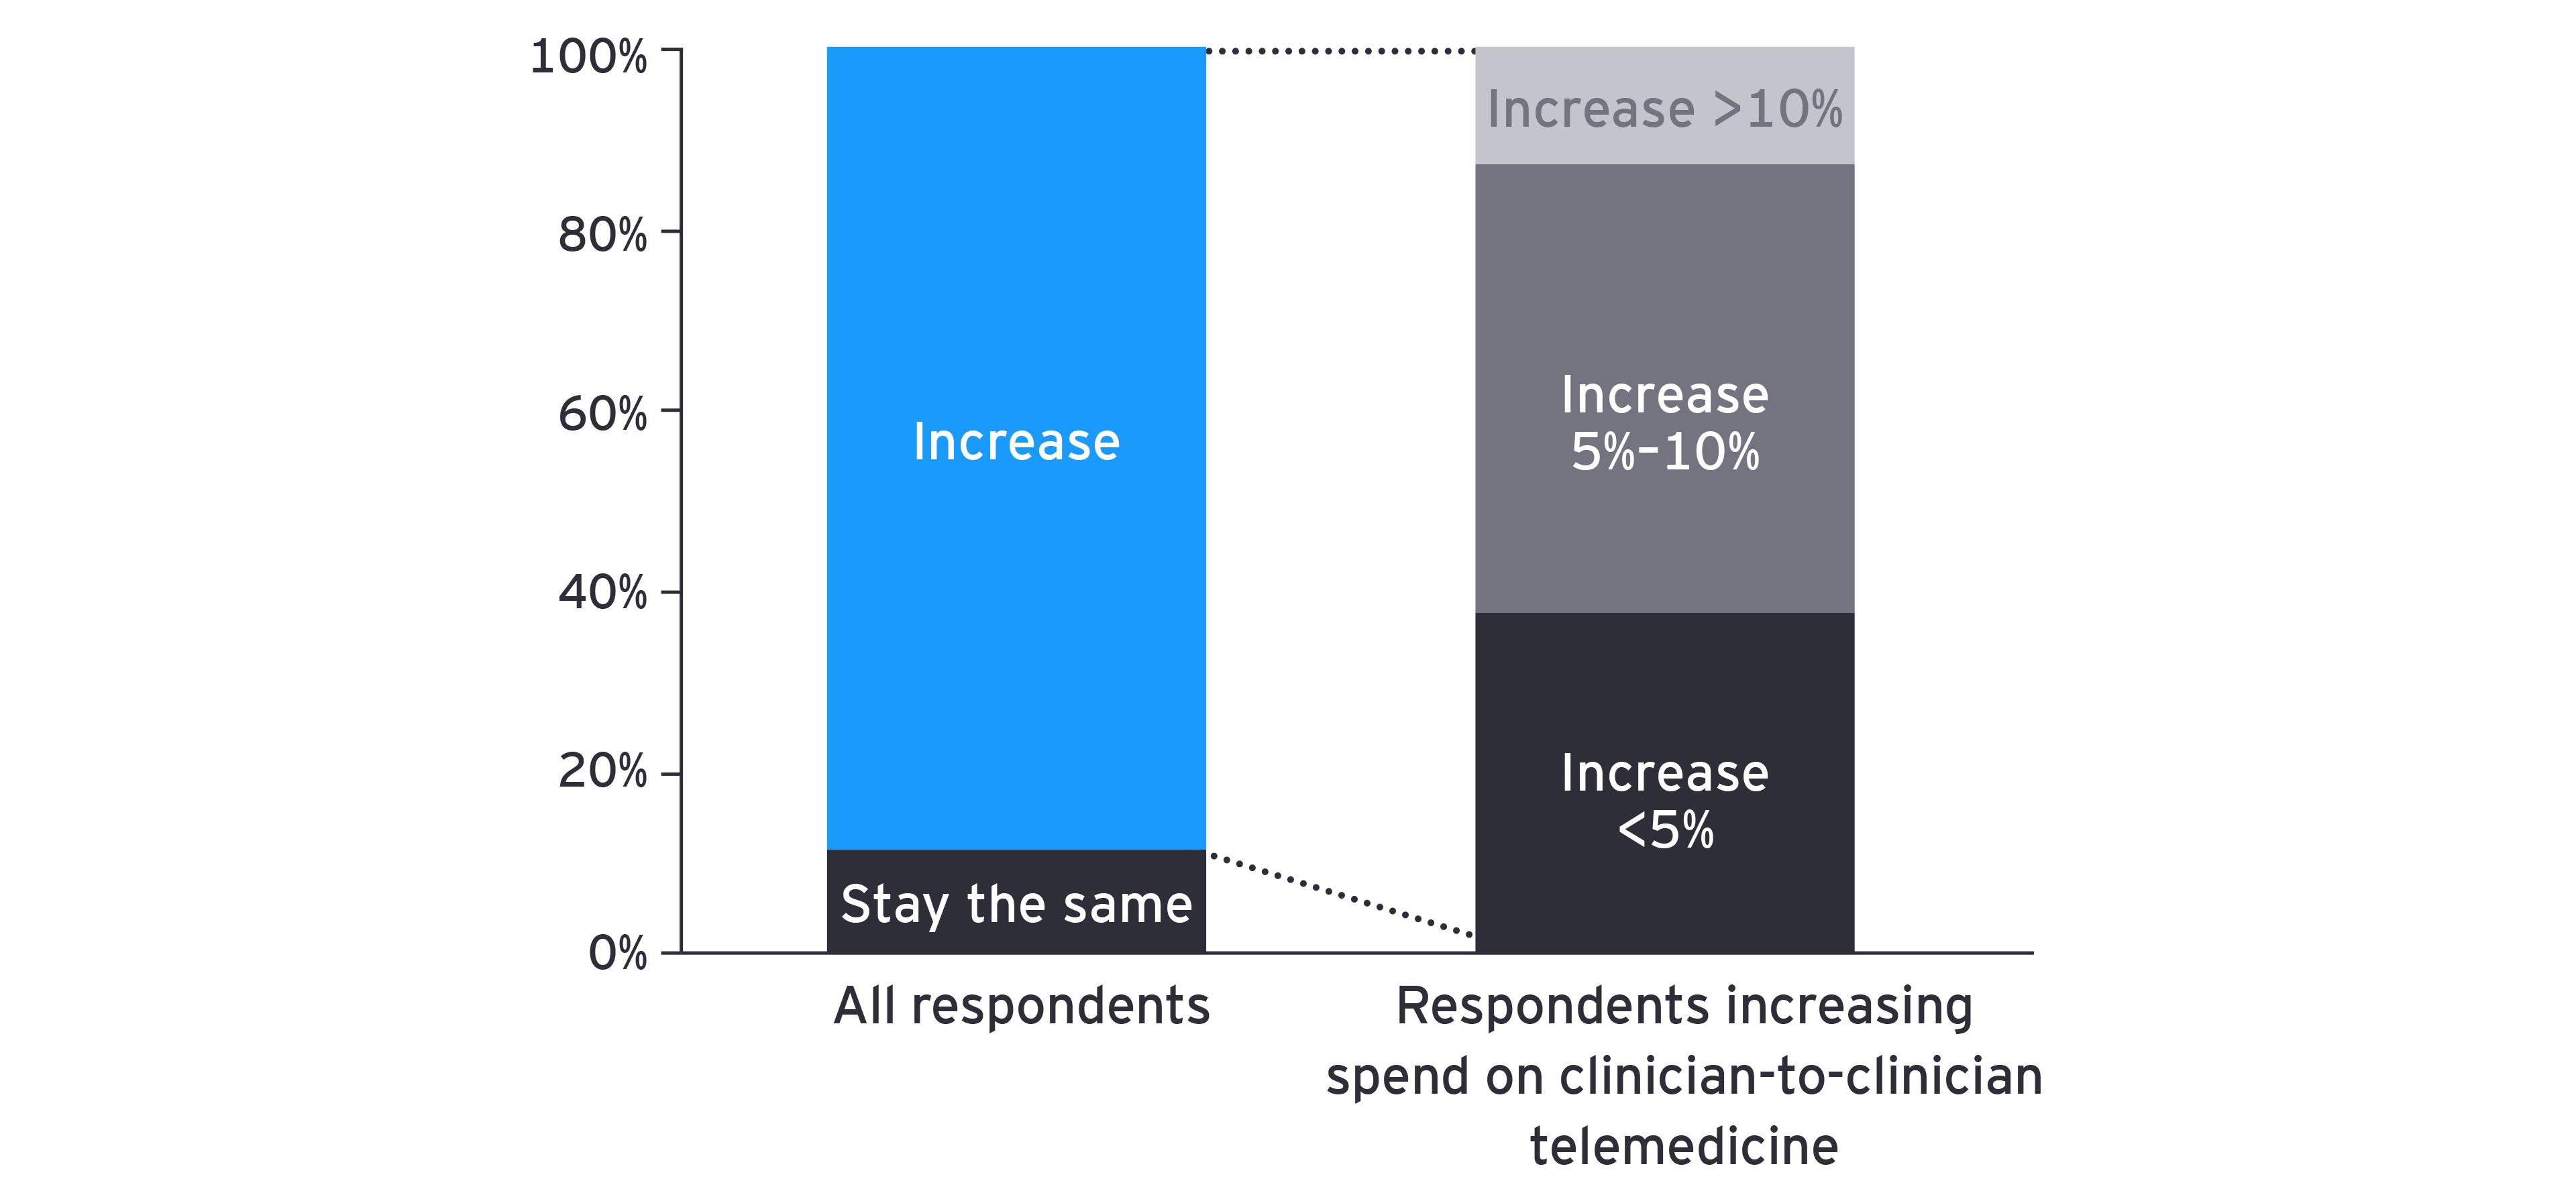 Chart: bars depicting increased spending